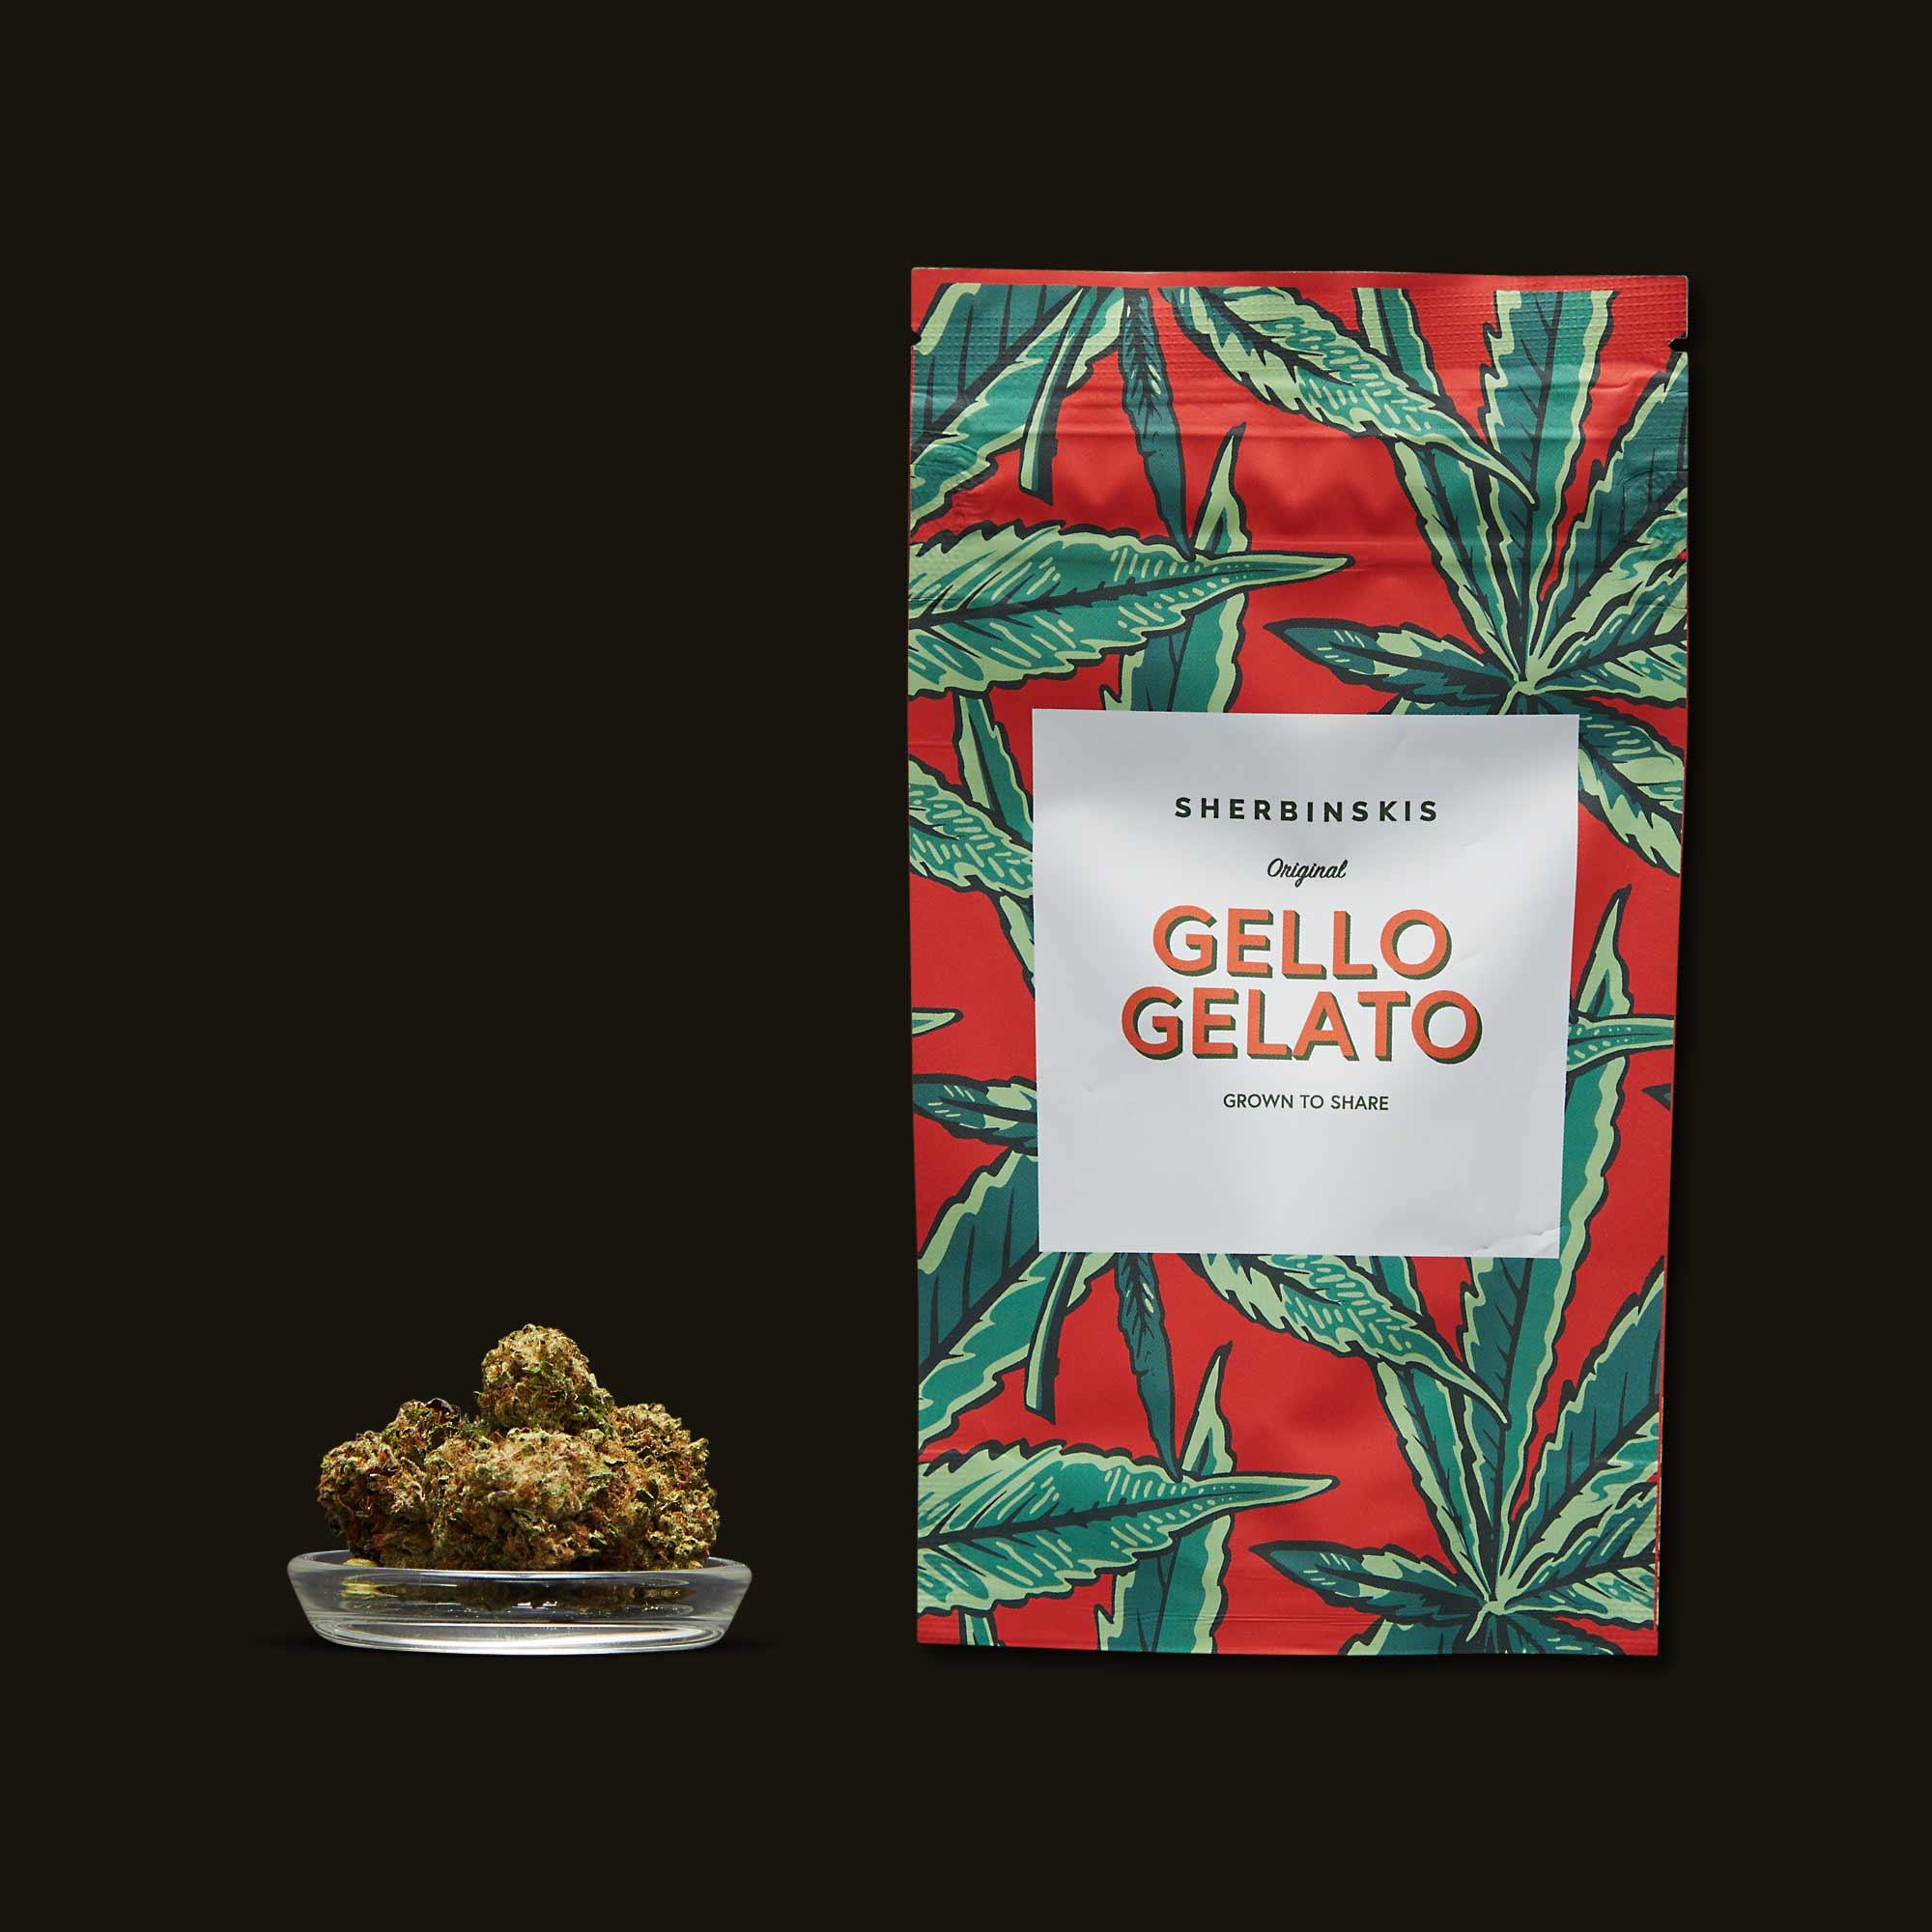 Sherbinskis Gello Gelato